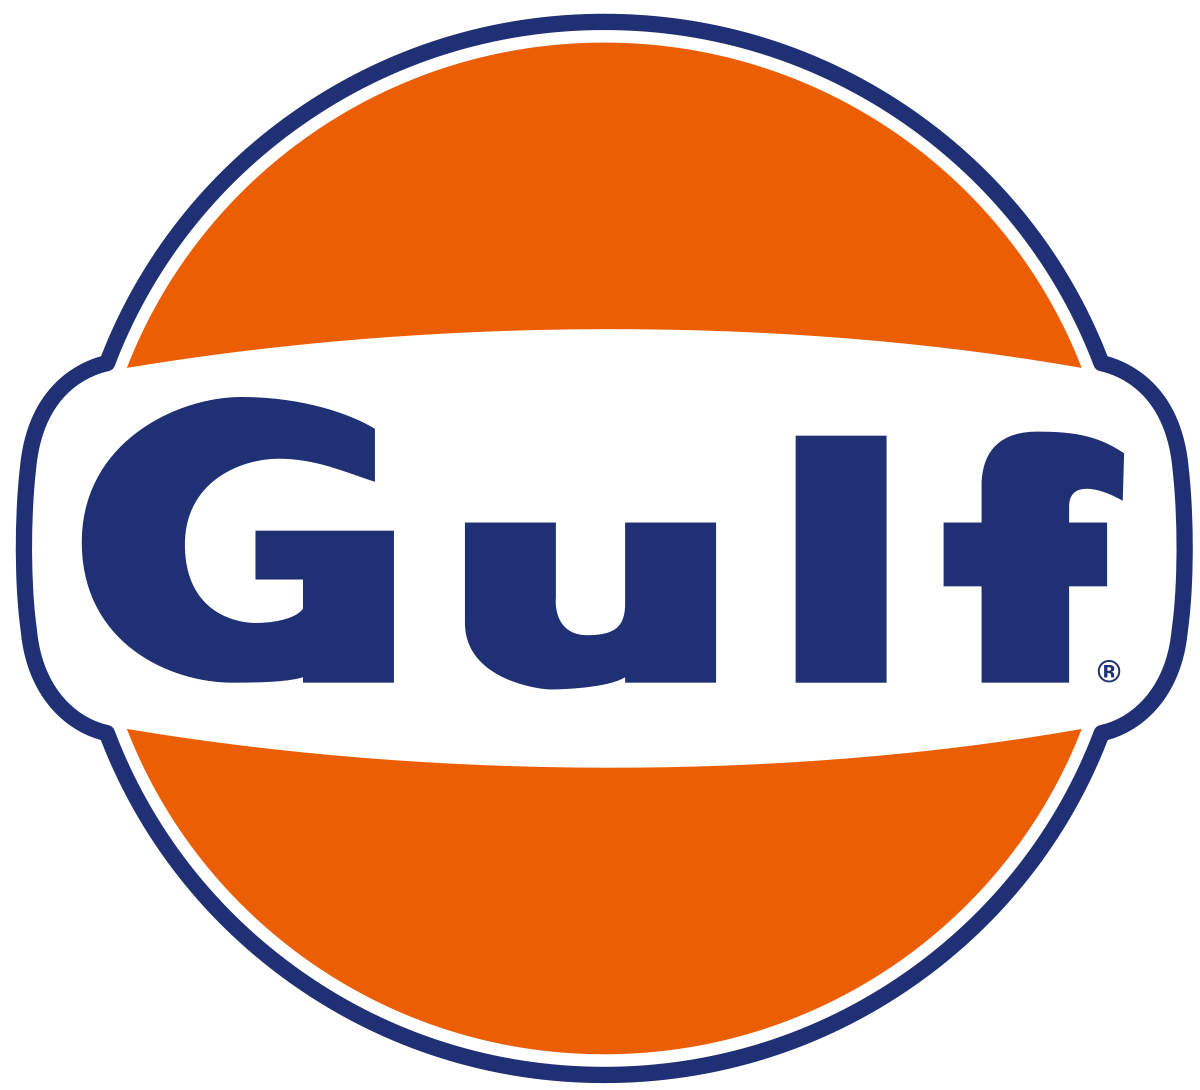 Gulf wikipedia . Industry clipart oil company